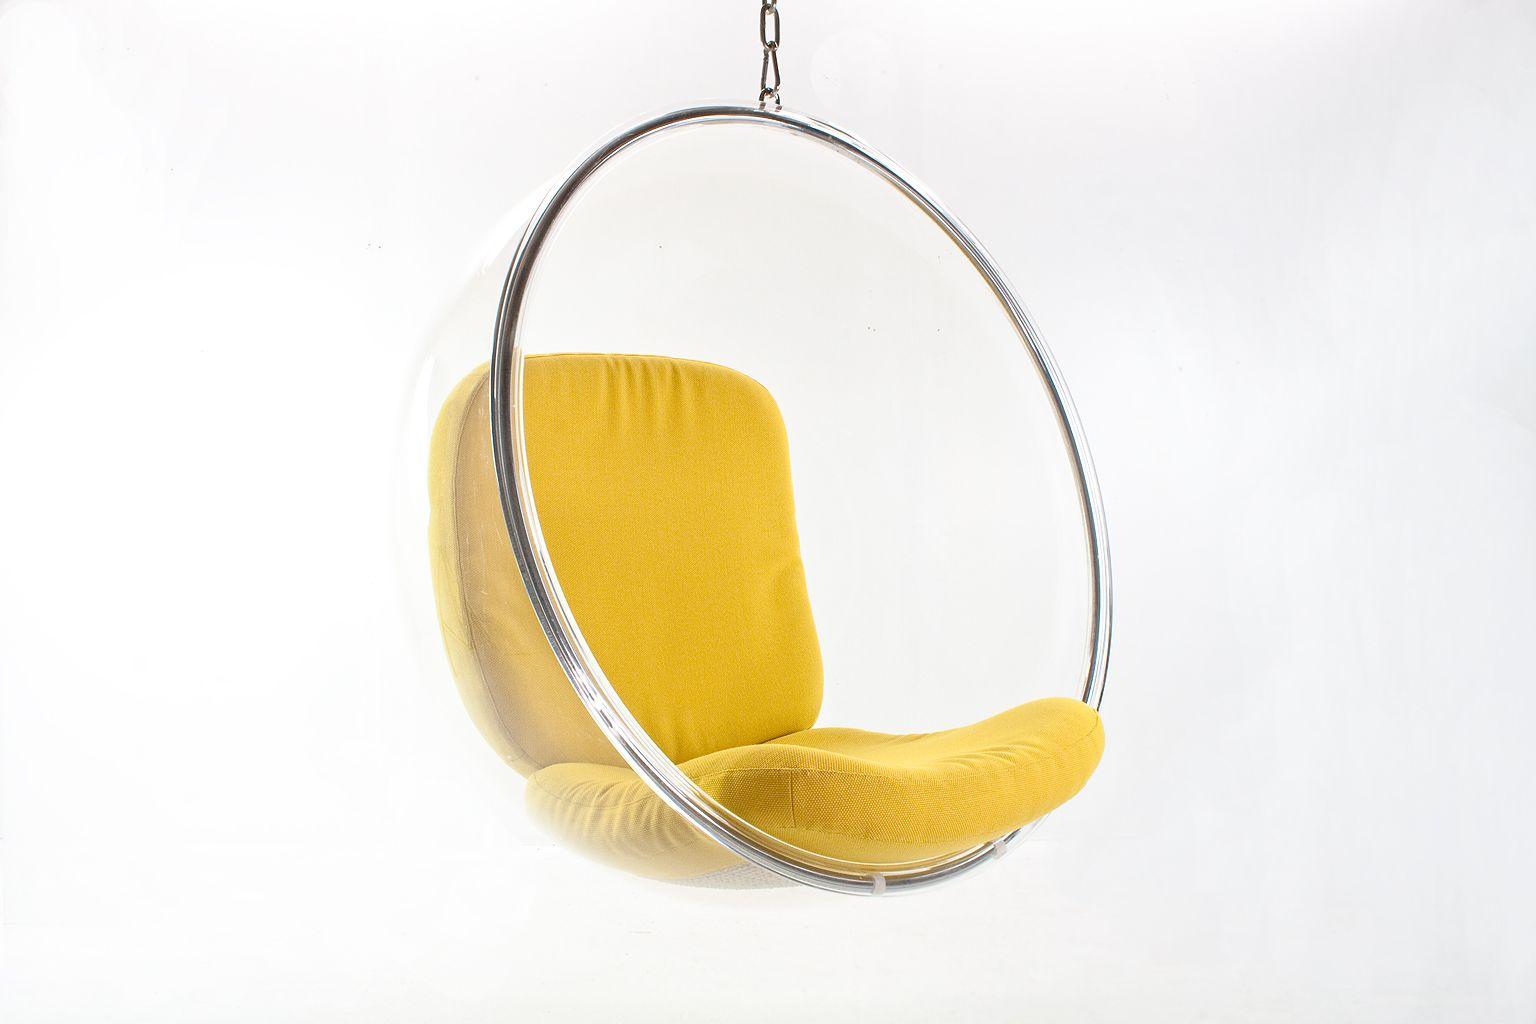 original acrylic bubble hanging chair of eero aarnio the bubble chair is designed by eero